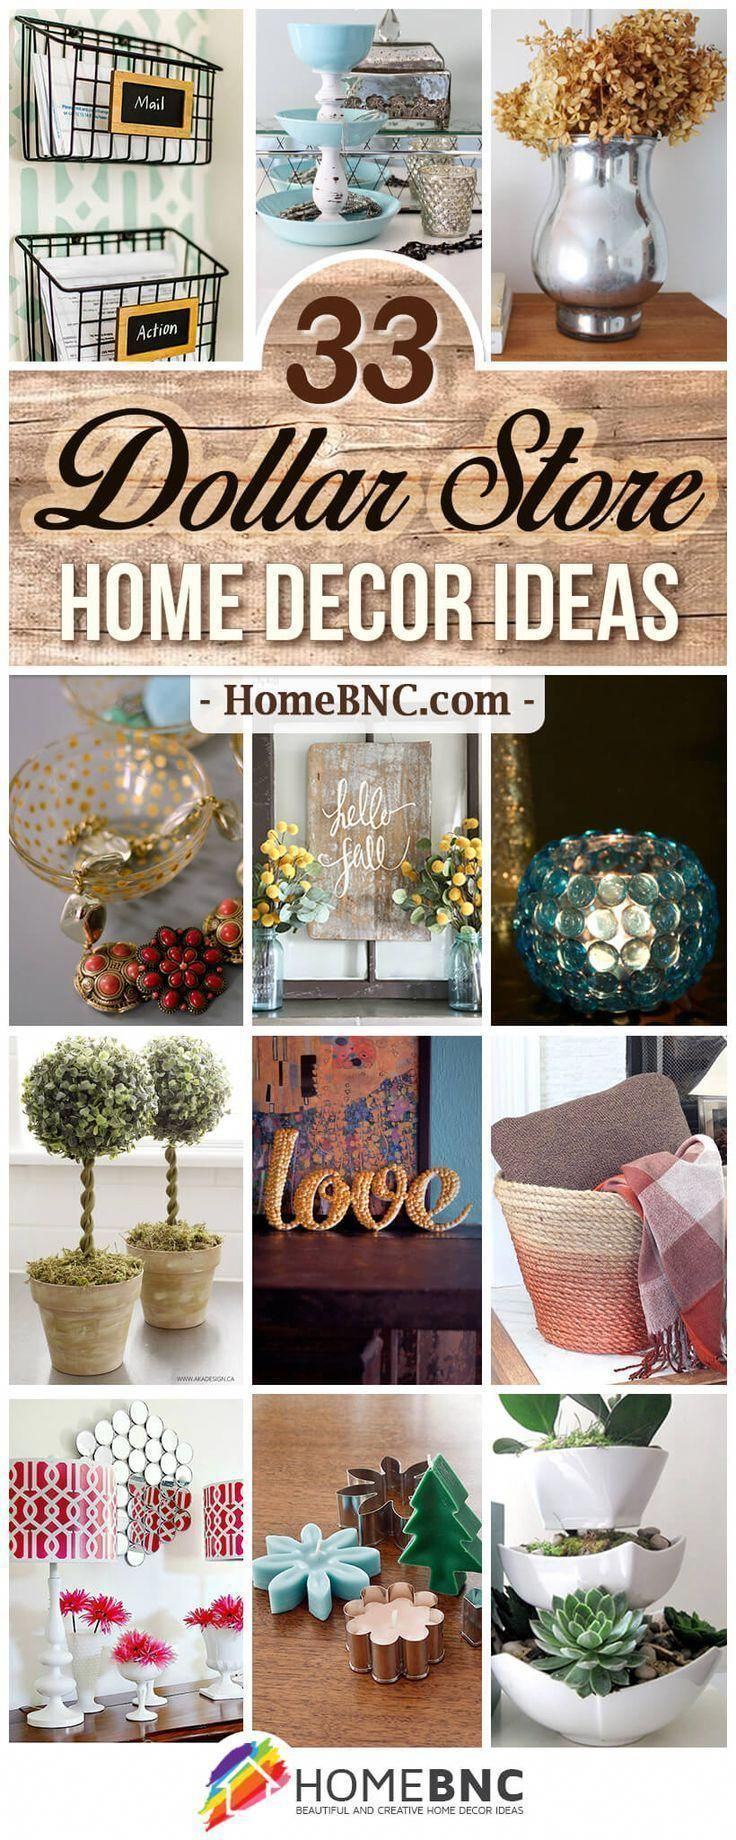 DIY Dollar Store Home Decor Ideas #homedecorNellie Jane Green Leach